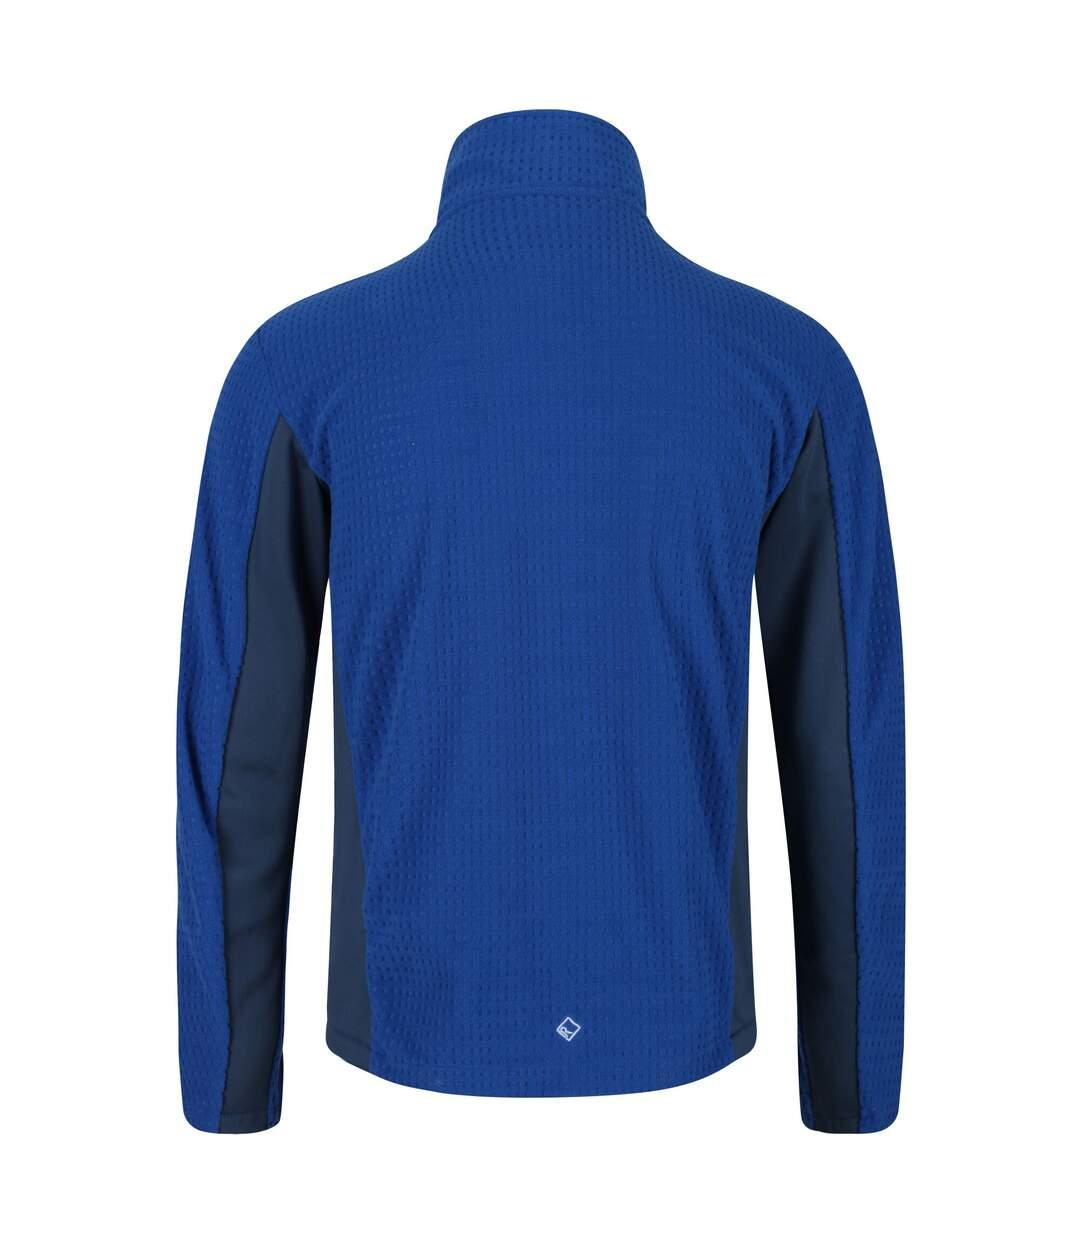 Regatta Mens Highton Full Zip Fleece (Nautical Blue/Dark Denim) - UTRG5040